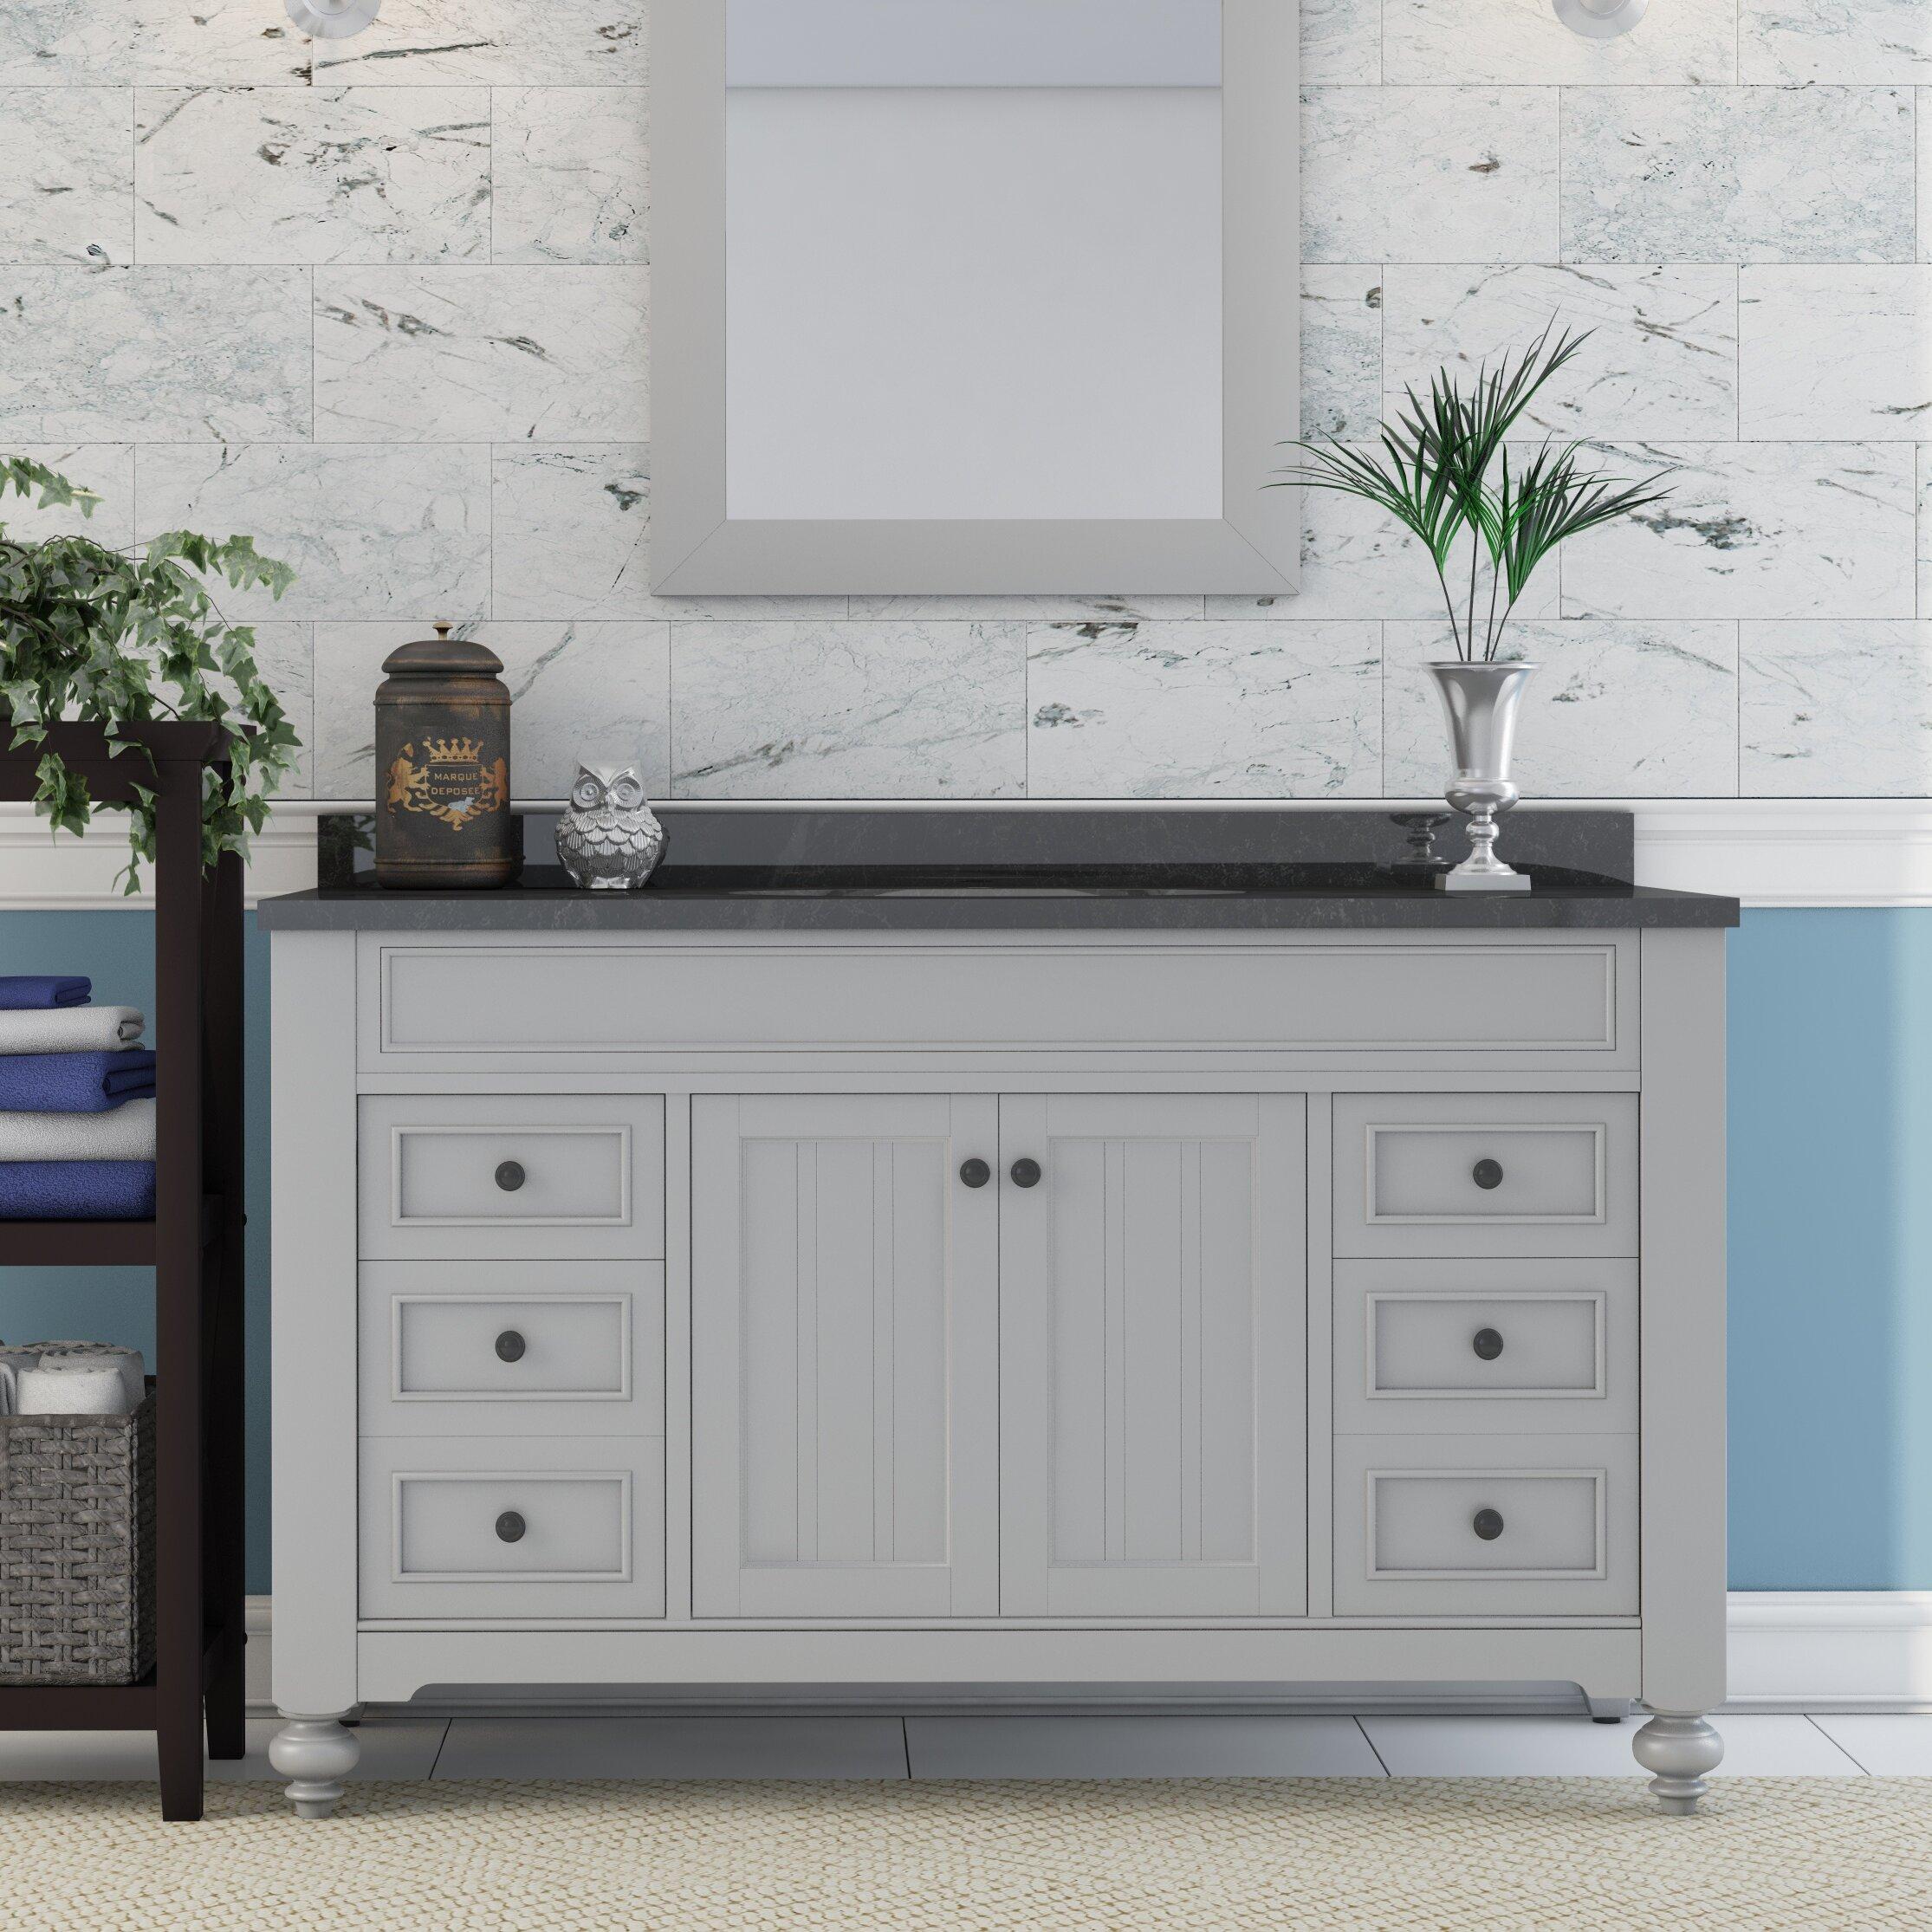 Darby Home Co Cabery 48 Single Bathroom Vanity Set Reviews Wayfair